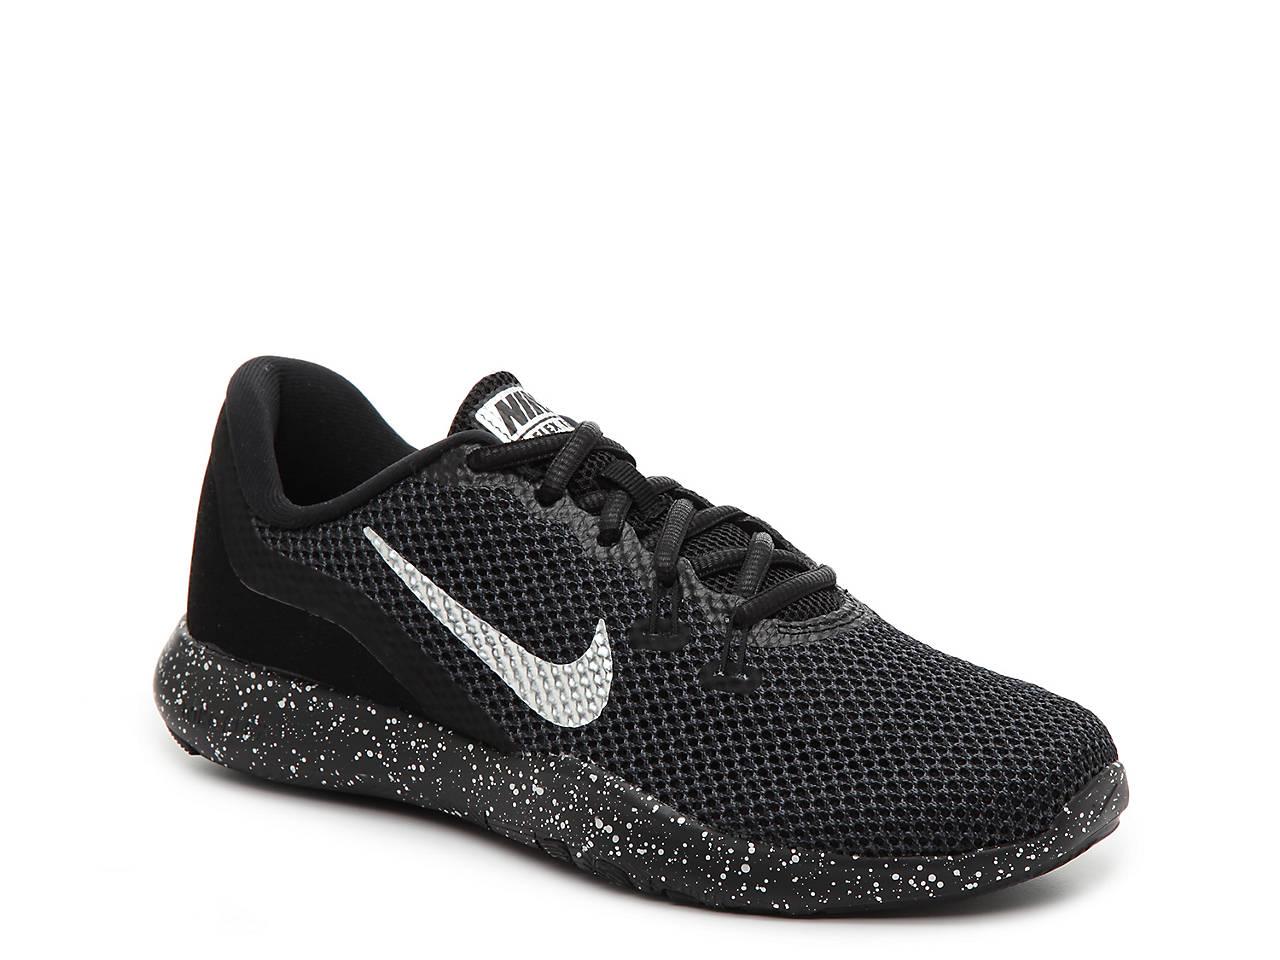 e3d8c539f0cb Nike Flex Trainer 7 Lightweight Training Shoe - Women s Women s ...